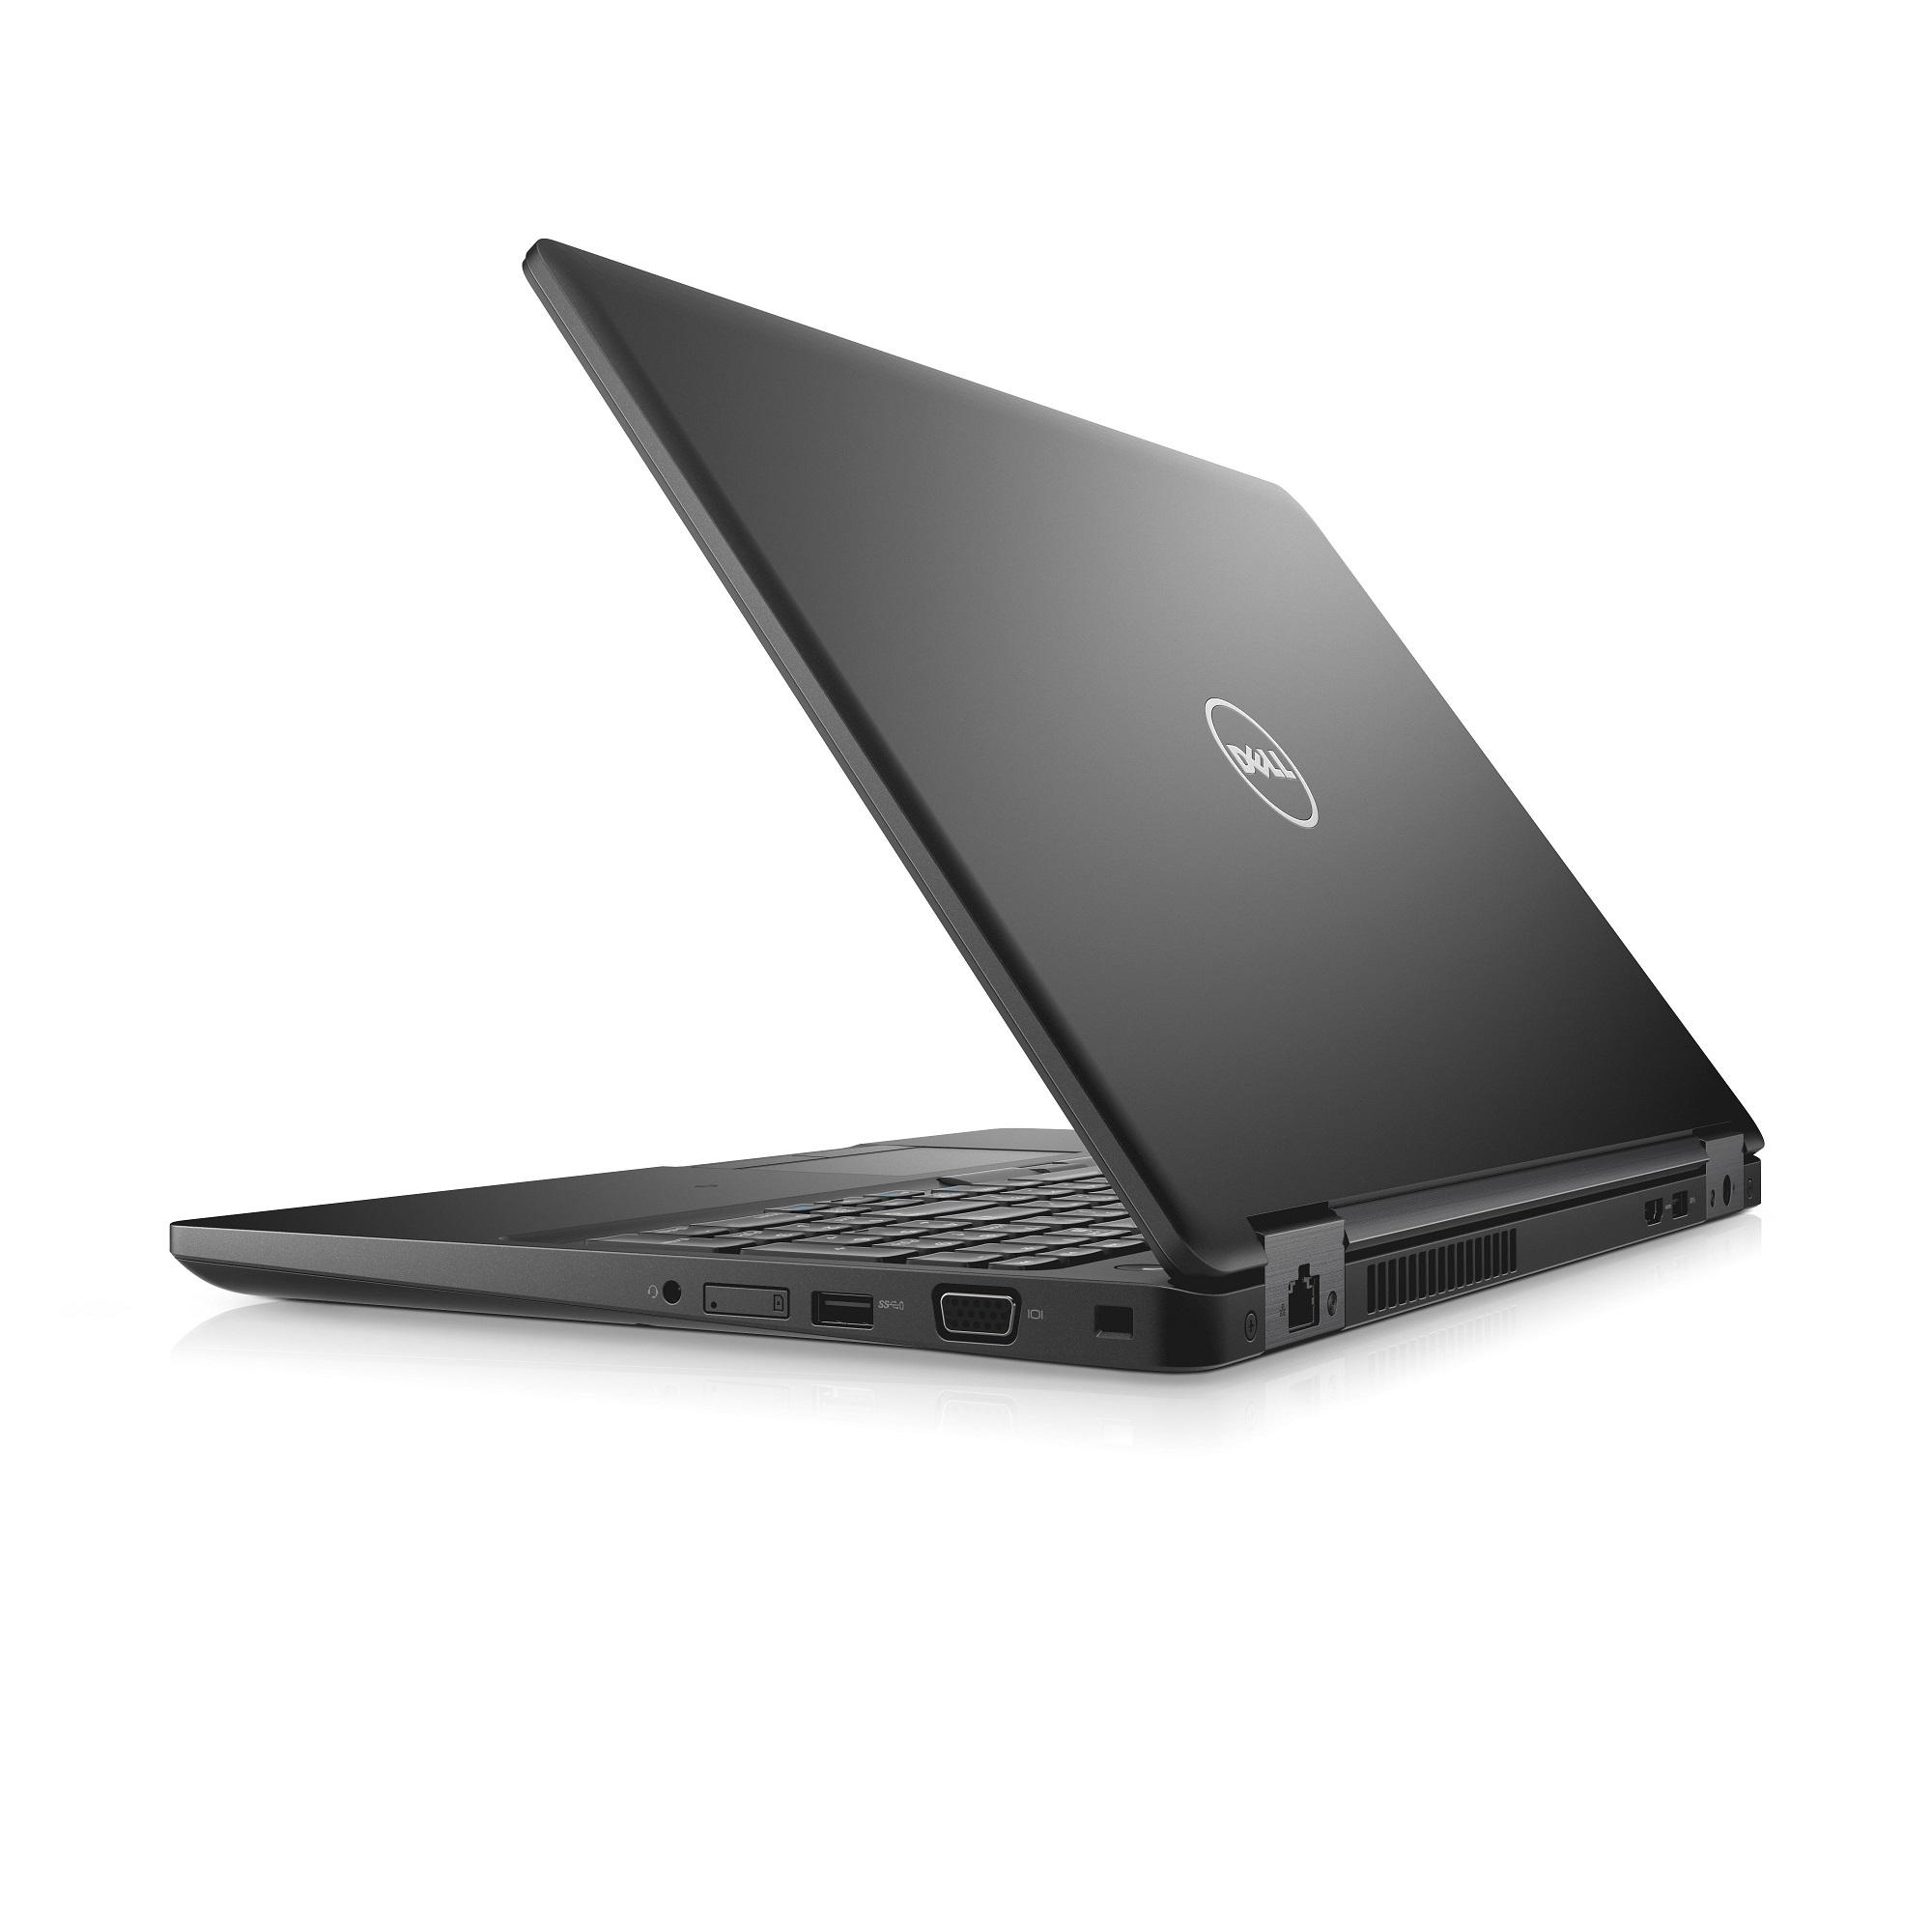 "Dell Latitude 5580 15"" HD i5-7300U/8G/128GB SSD/SCR/MCR/HDMI/VGA/USB-C/W10P/3RNBD/Černý"